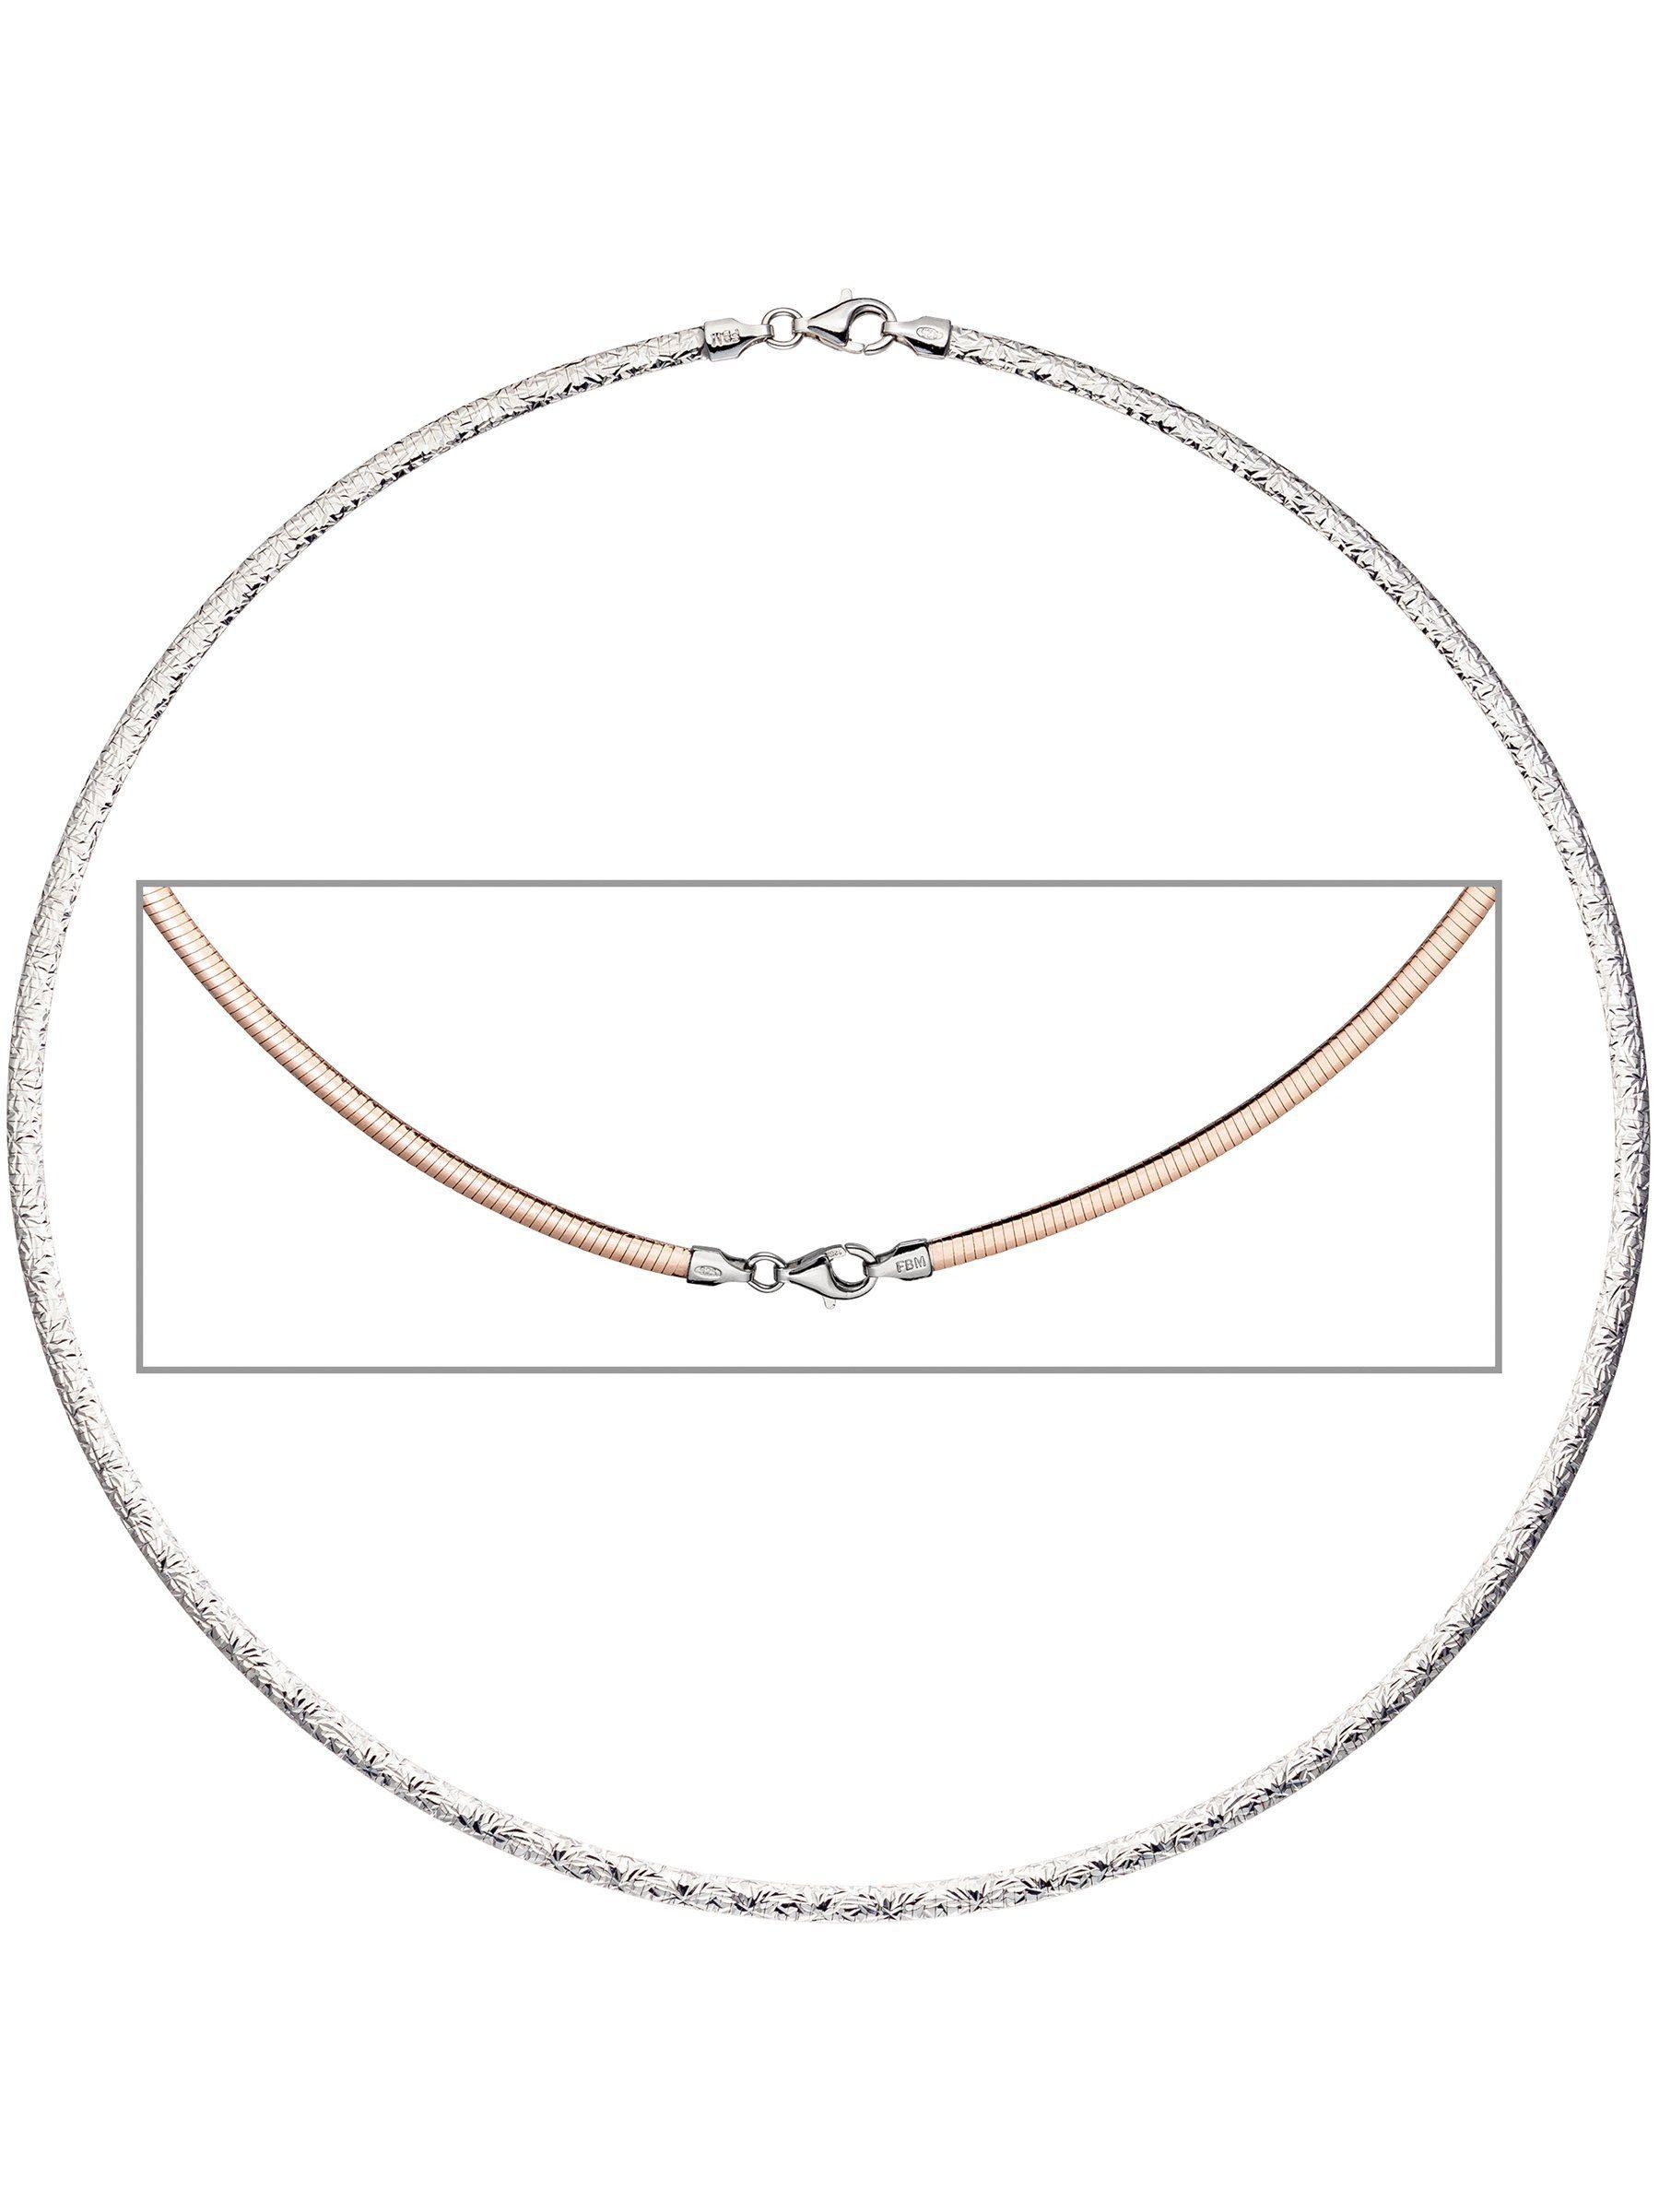 Adelia´s Halsreif 925 Silber L - 45 cm